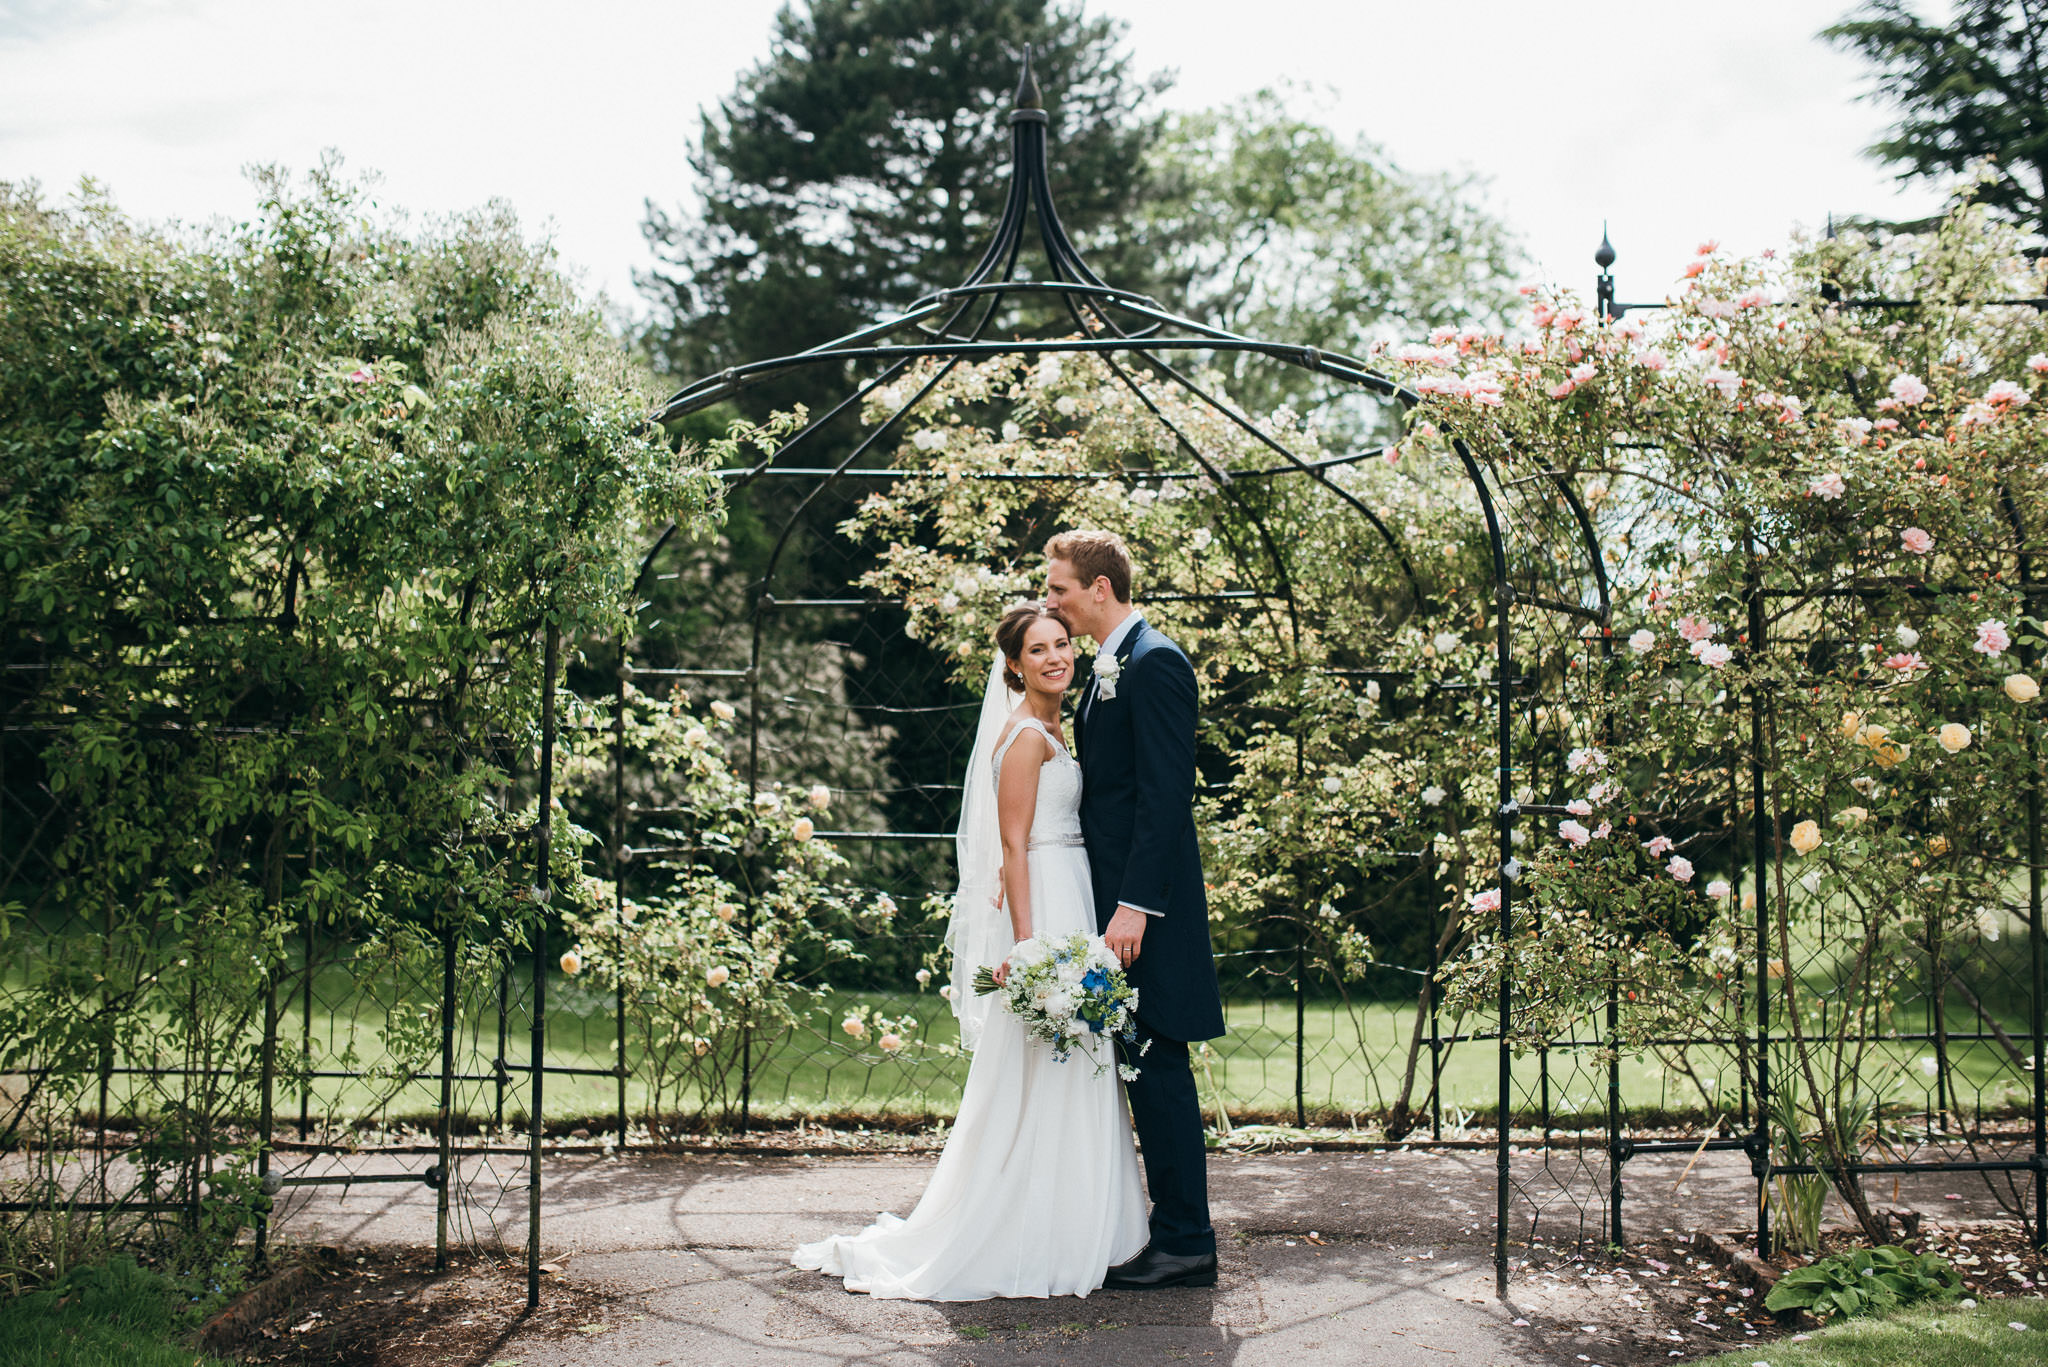 Nonsuch wedding venue simon biffen photography 3